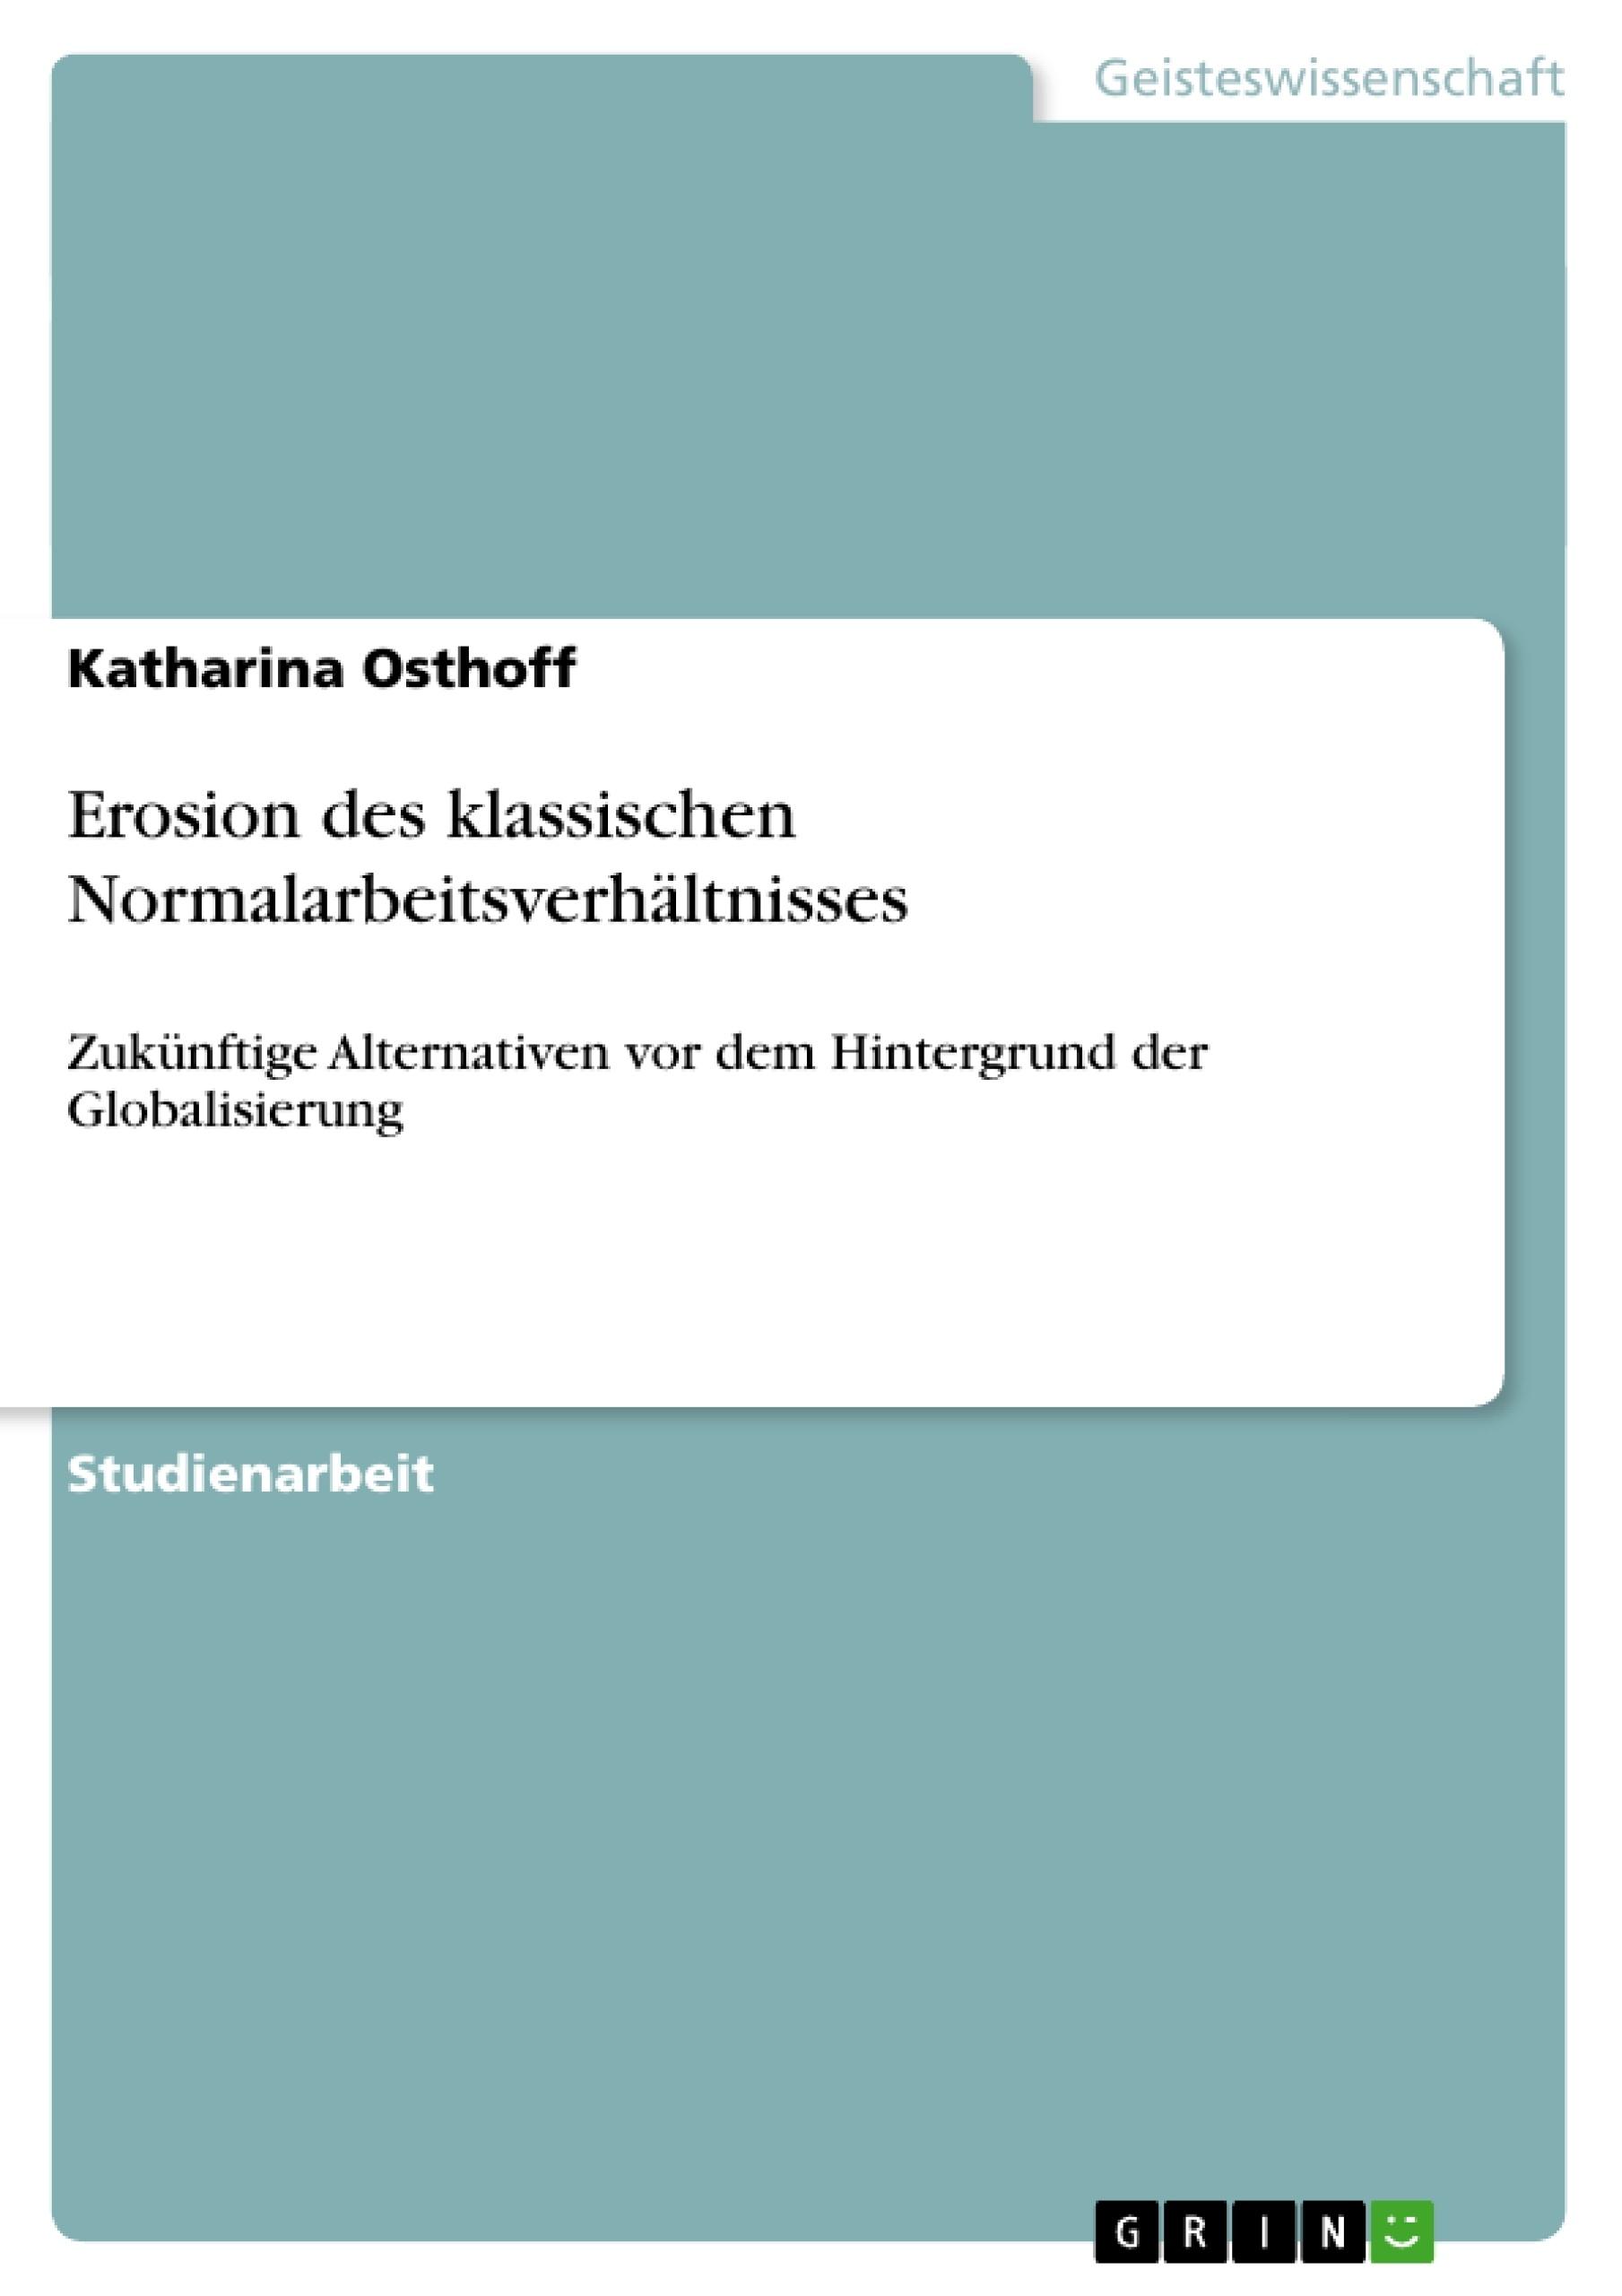 Titel: Erosion des klassischen Normalarbeitsverhältnisses